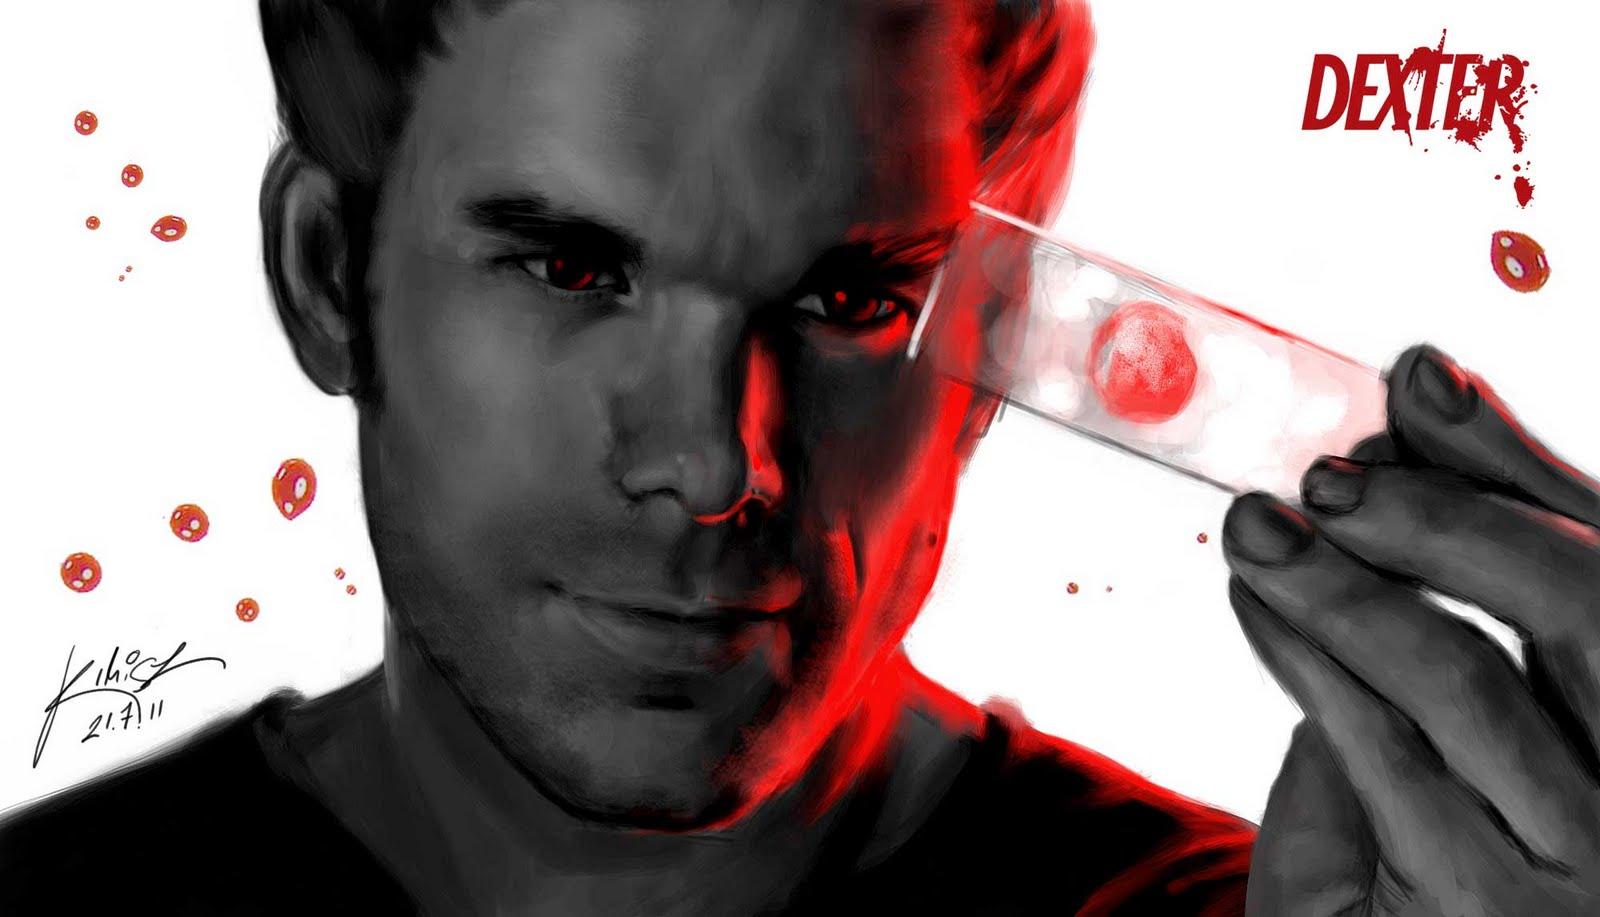 Portrait-Dexter.jpg